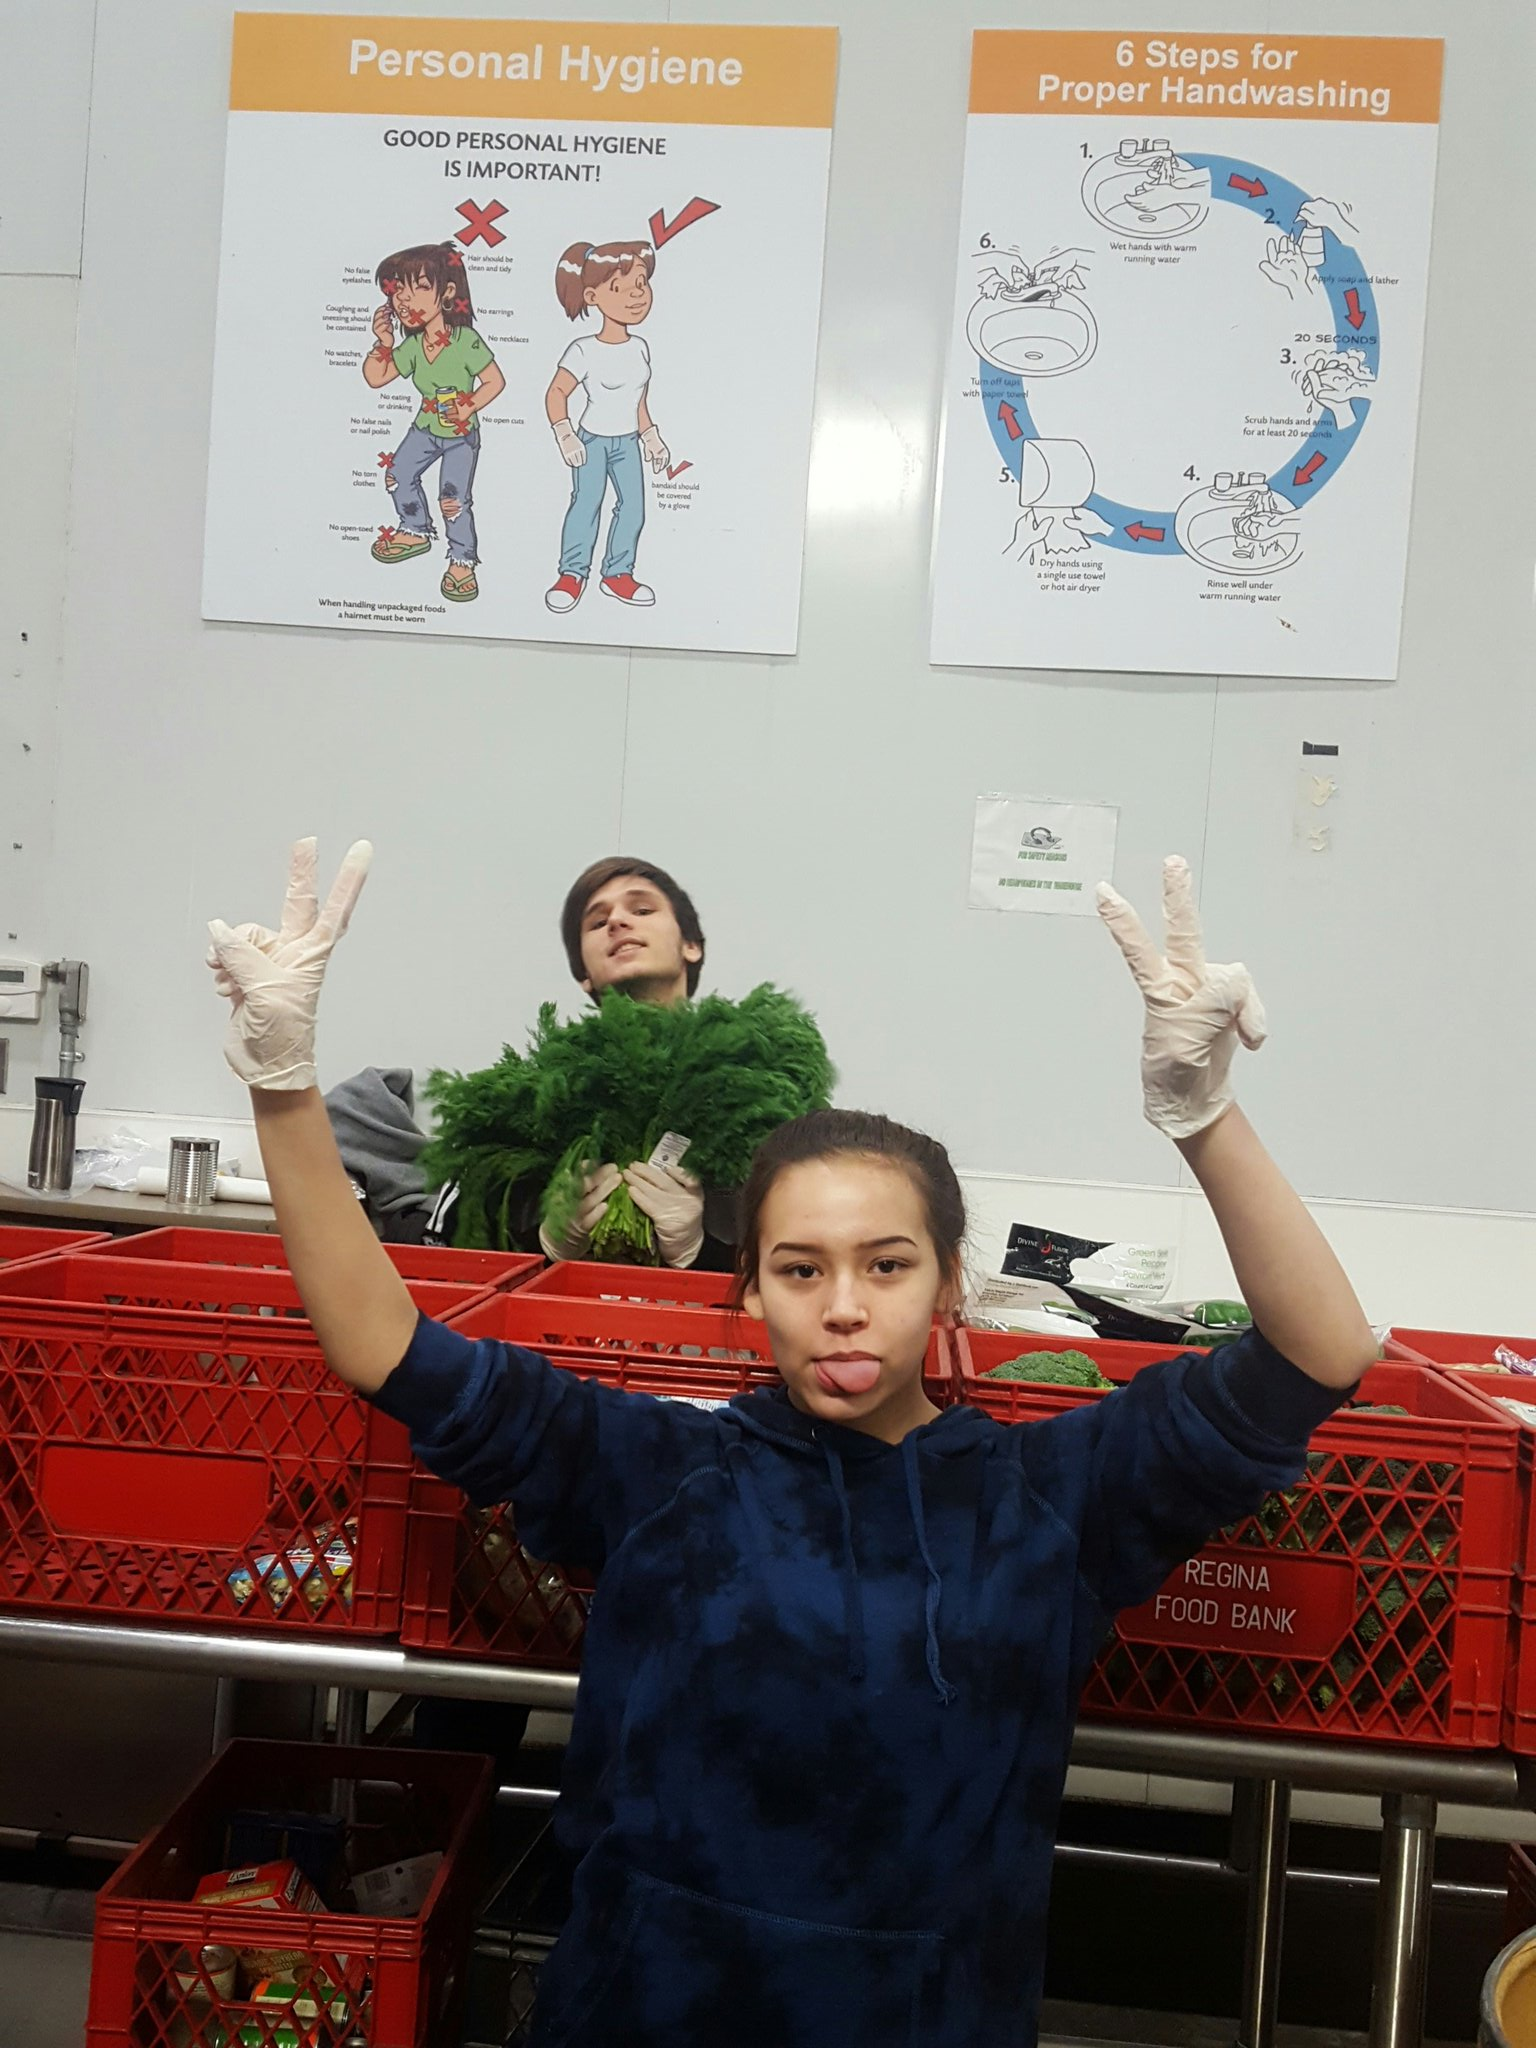 Grade 12 helper adding some goofiness to the veggie sorting group 🙃 @oneilltitans @ReginaFoodBank @HaileyKaija https://t.co/Asj0pKLCPw